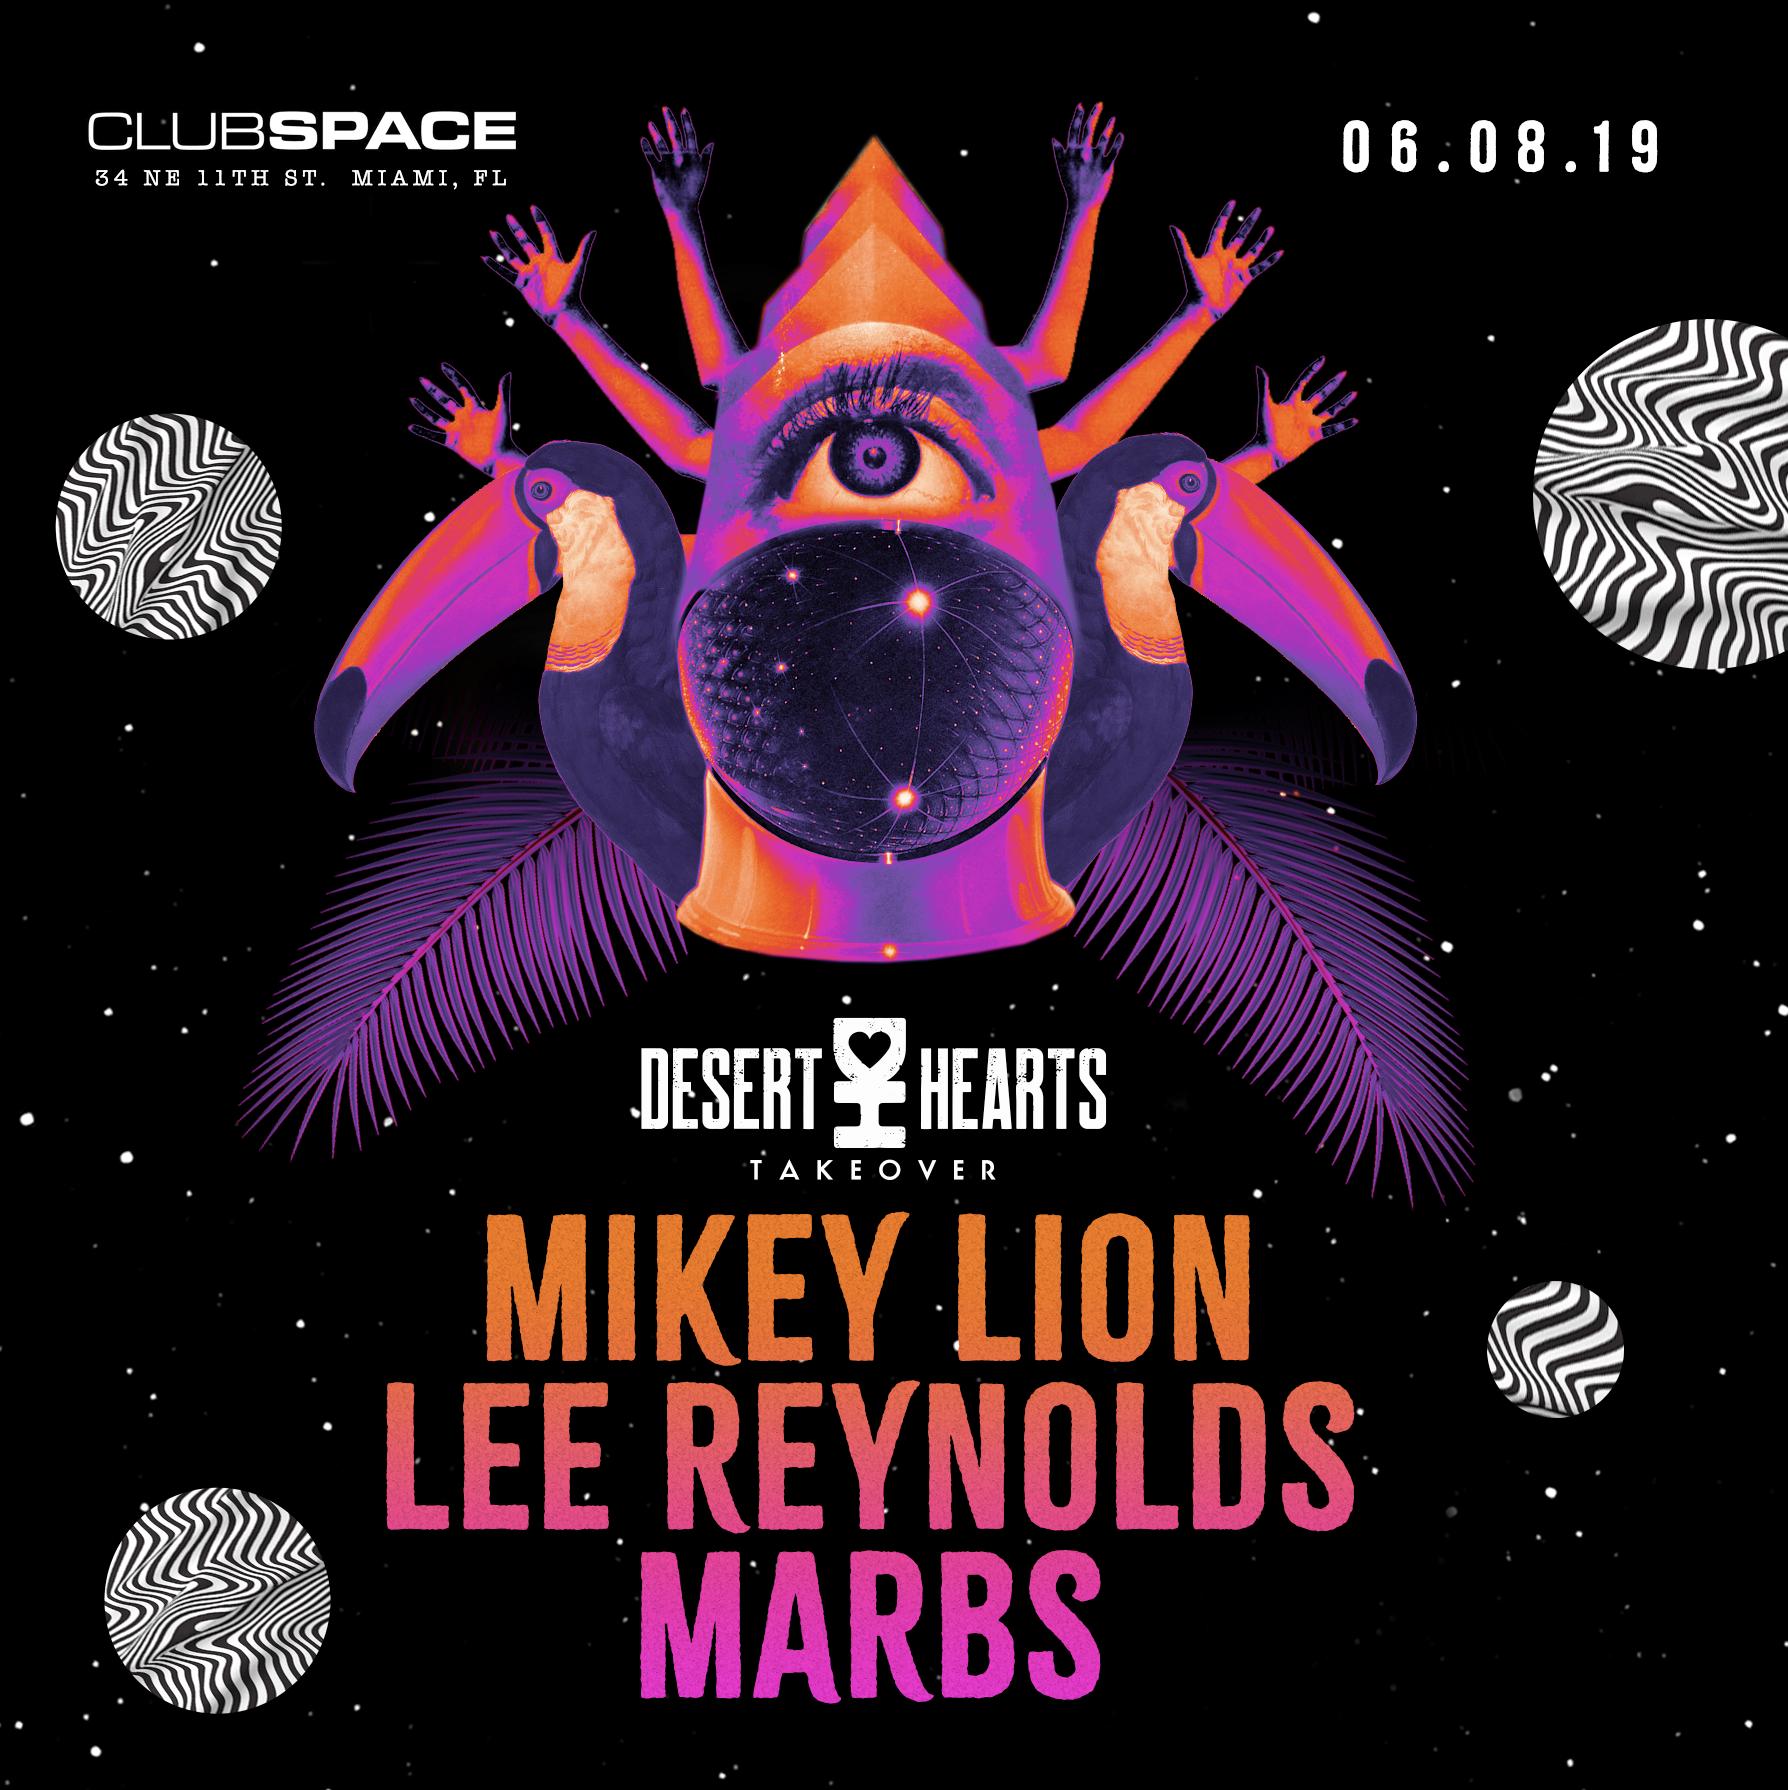 20190608 - Club Space.png